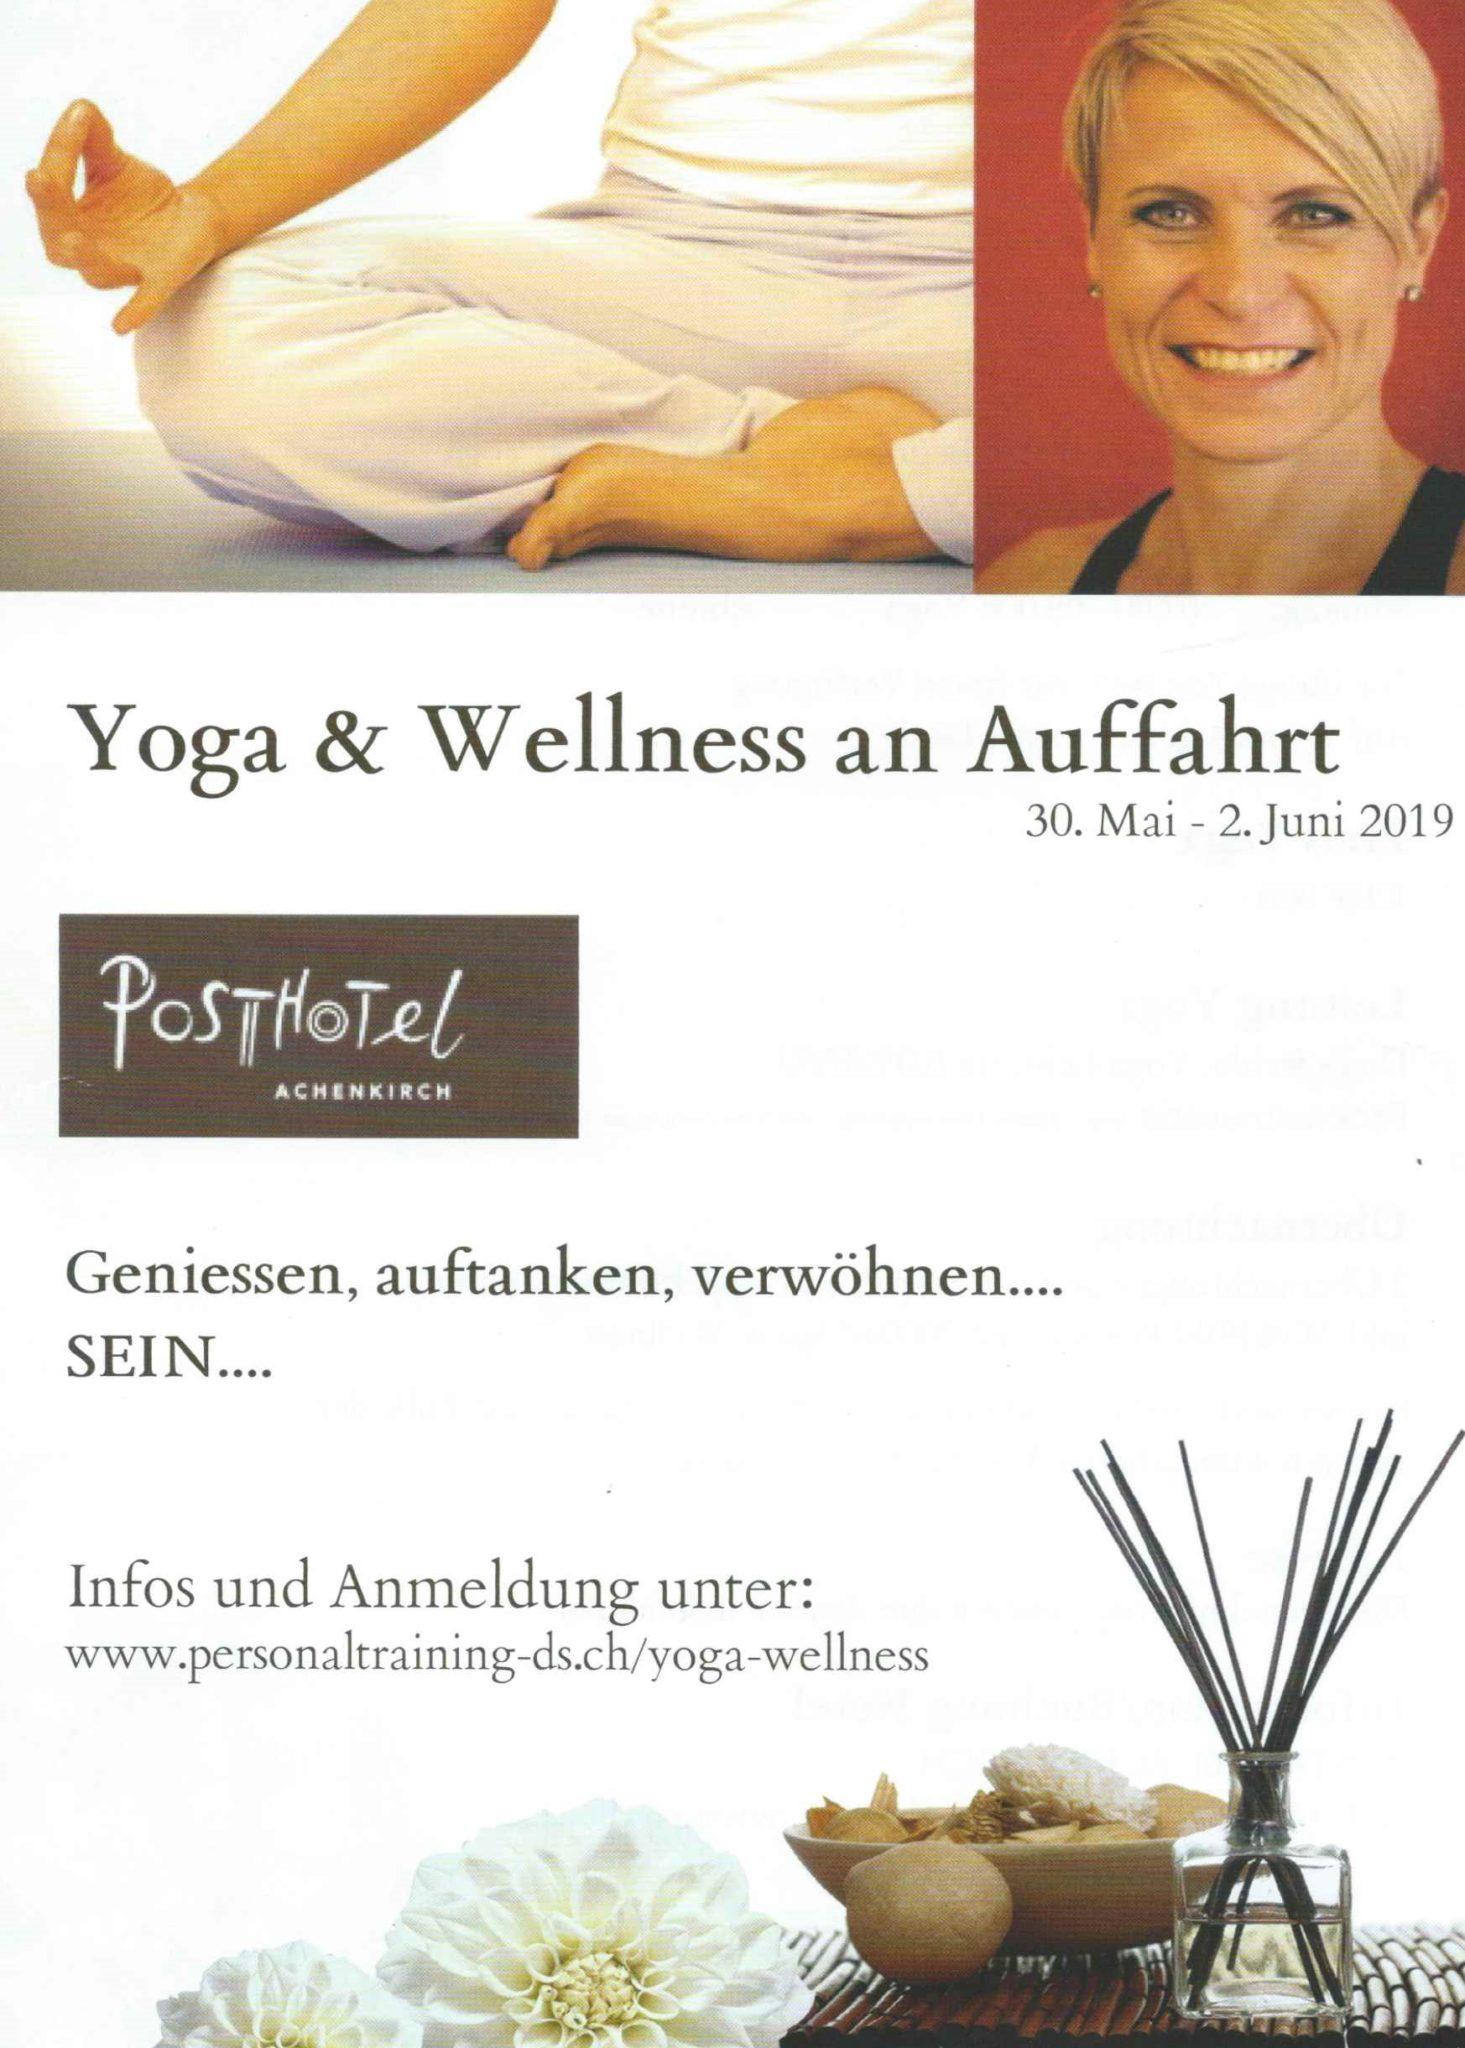 Flyer Yoga & Yoga & Wellness an Auffahrt 2019